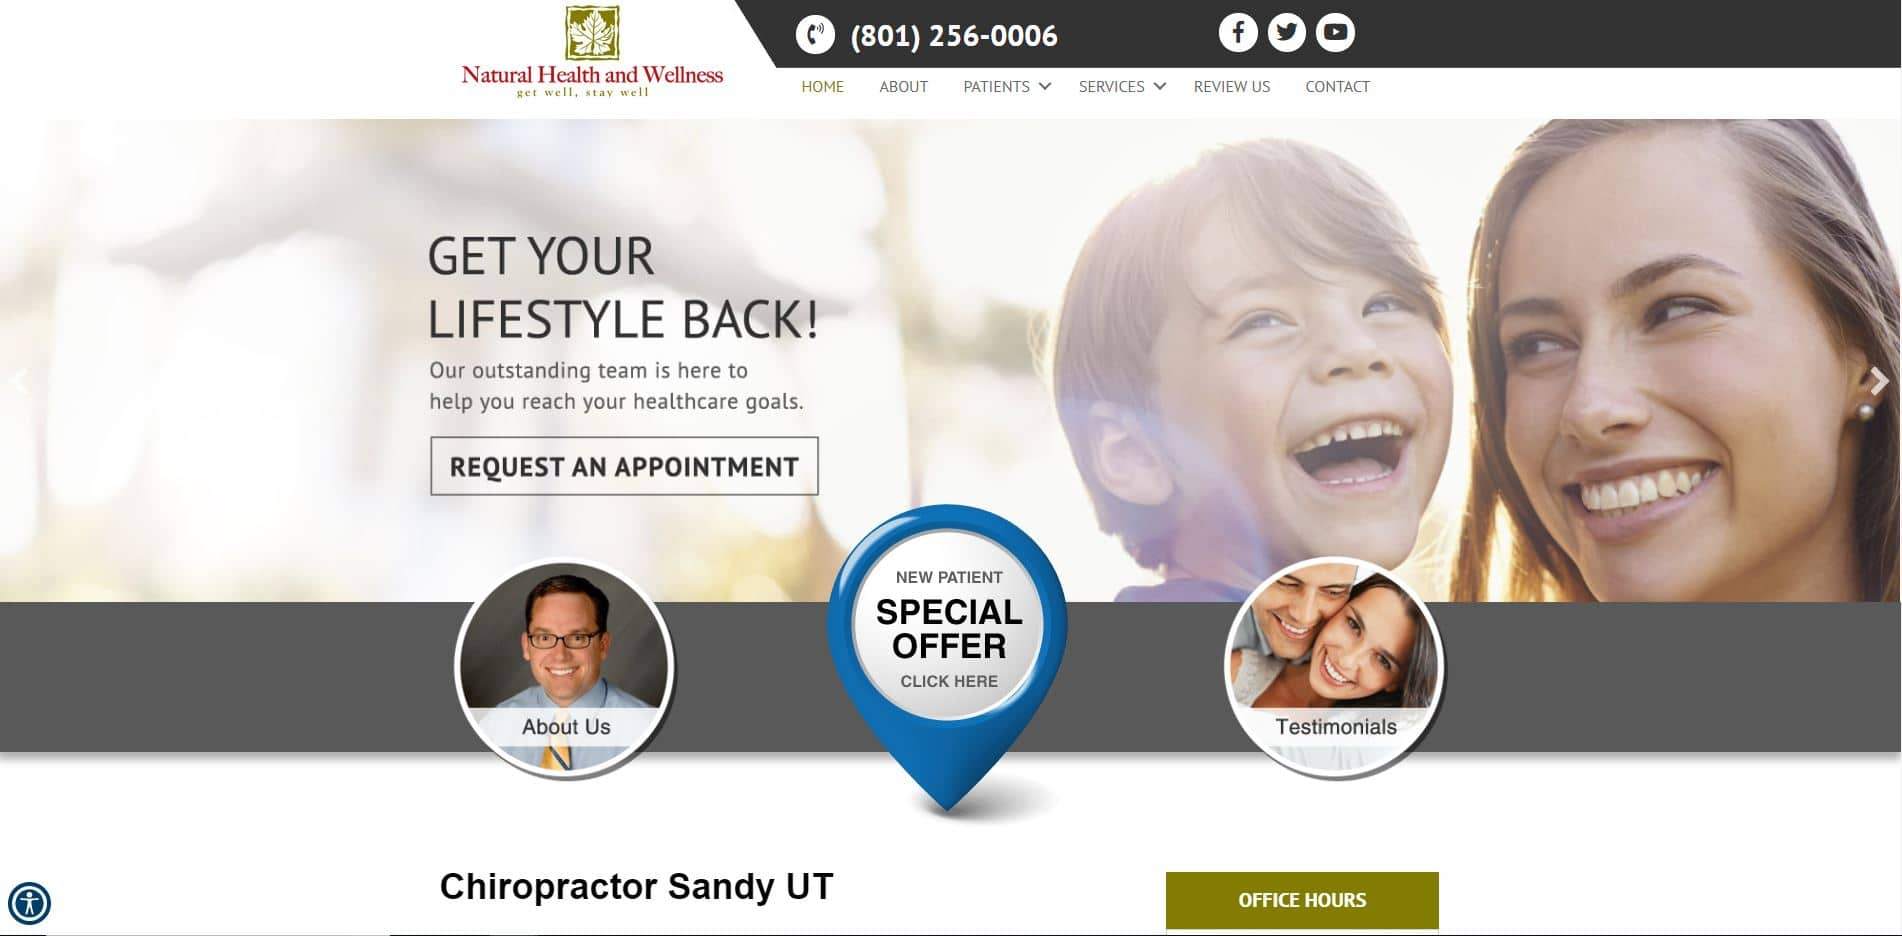 Chiropractor in Sandy